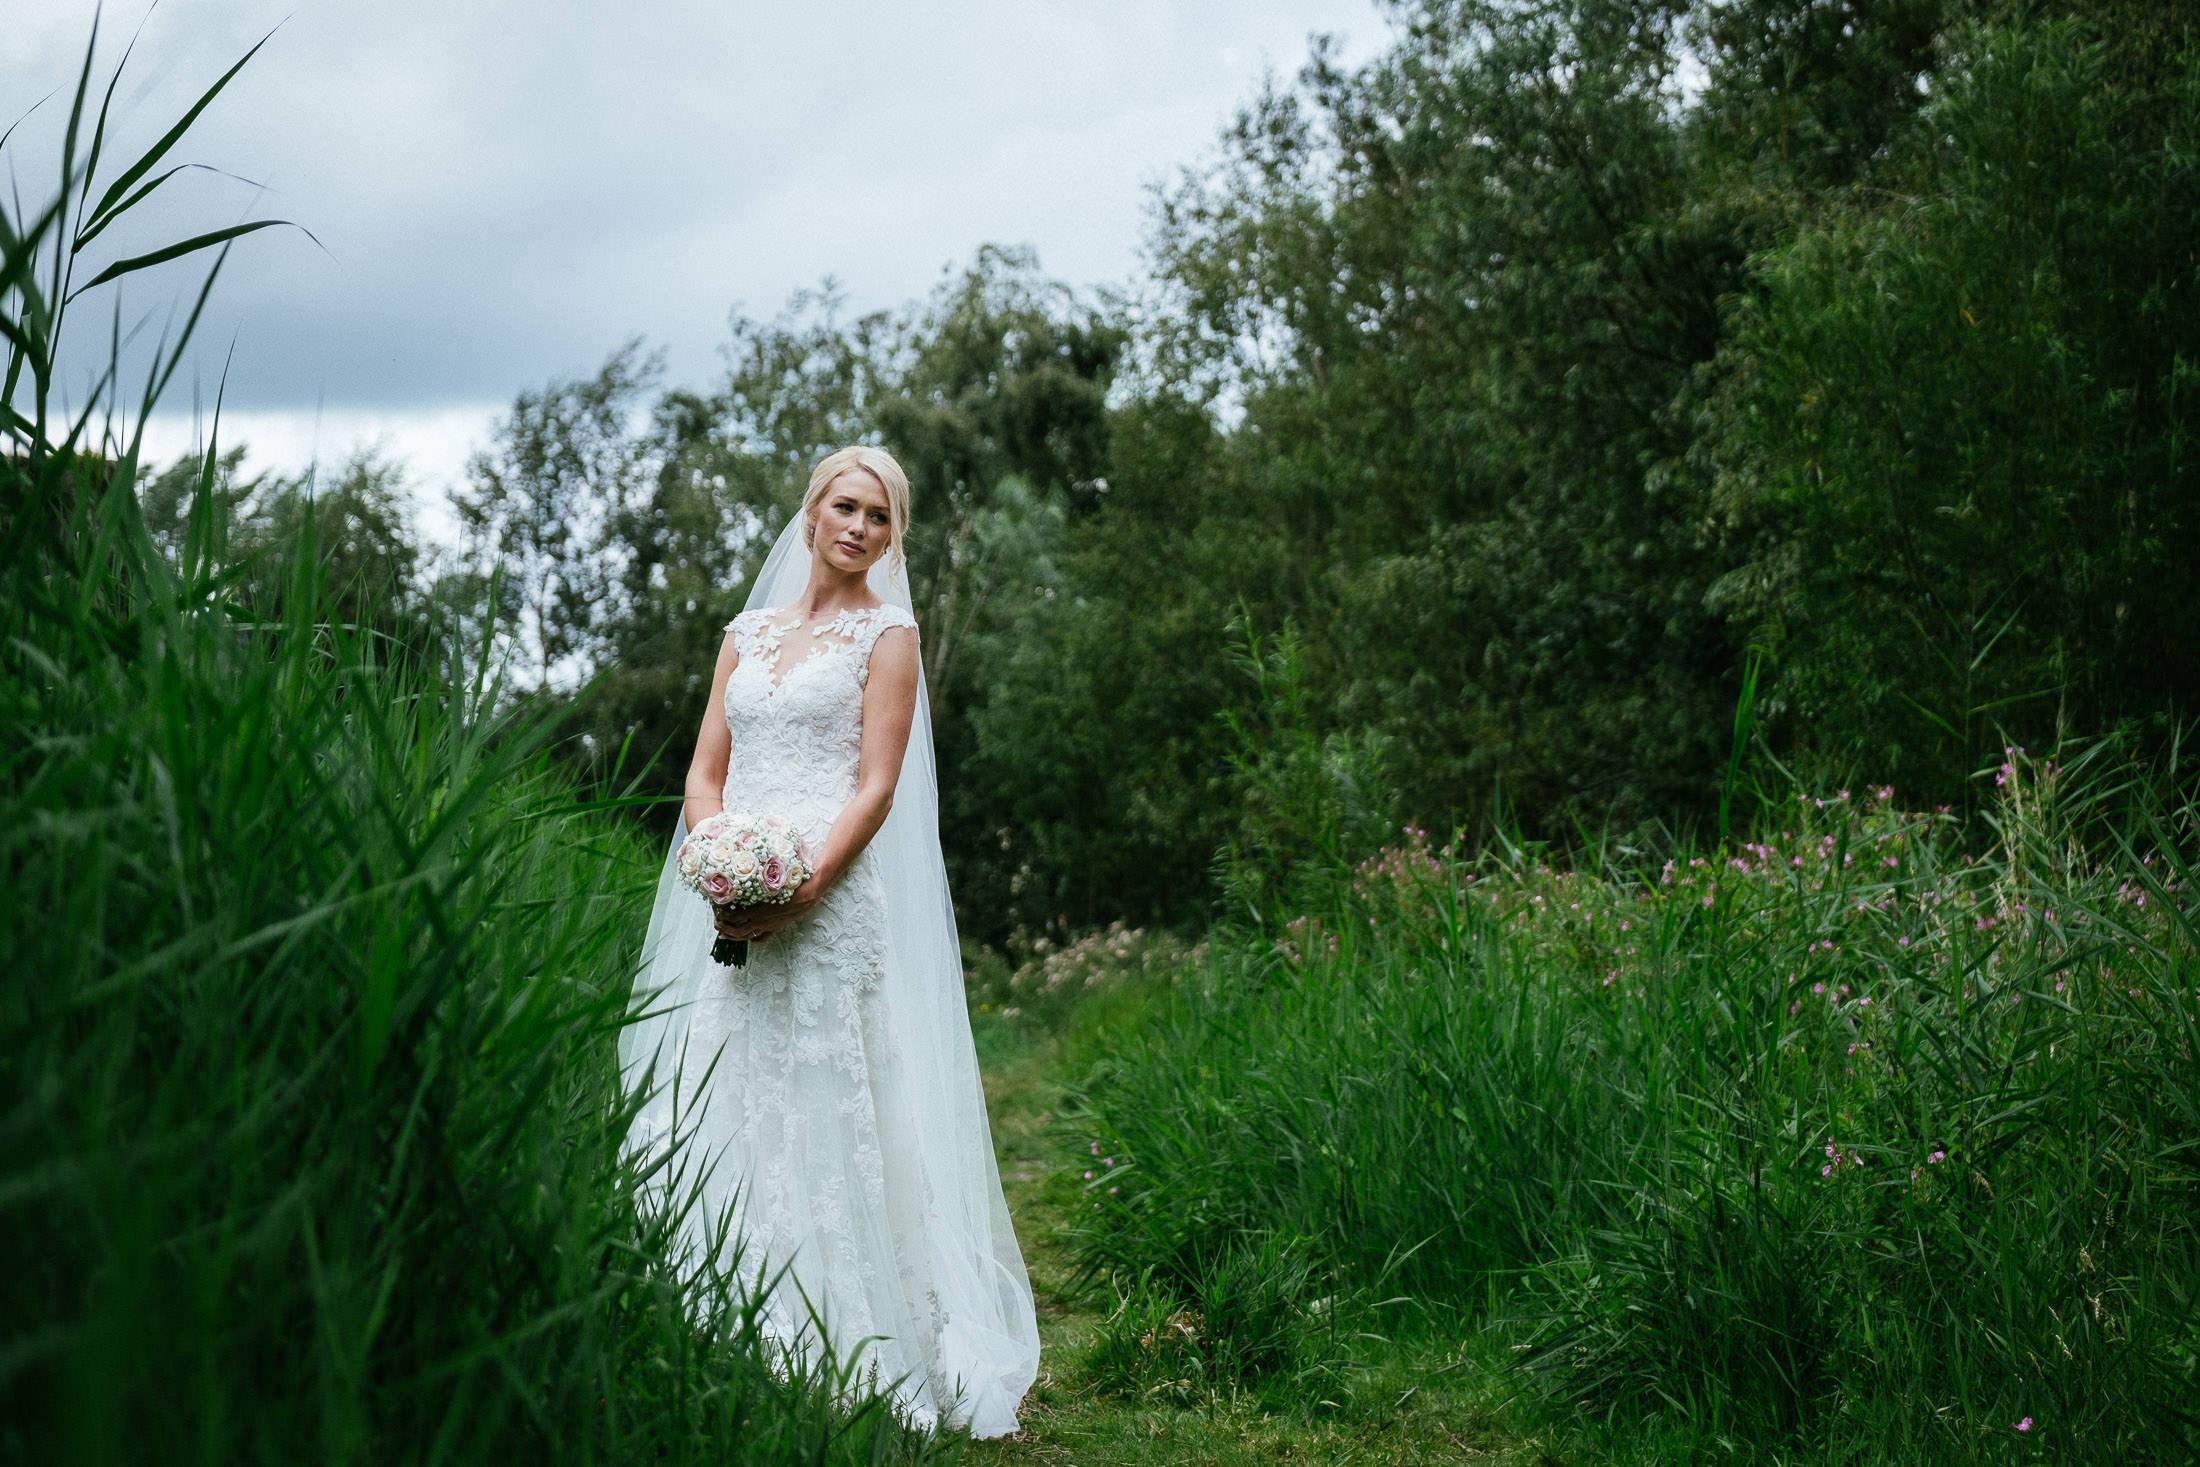 Knightsbrook Hotel Trim Castle Wedding Photographer 79